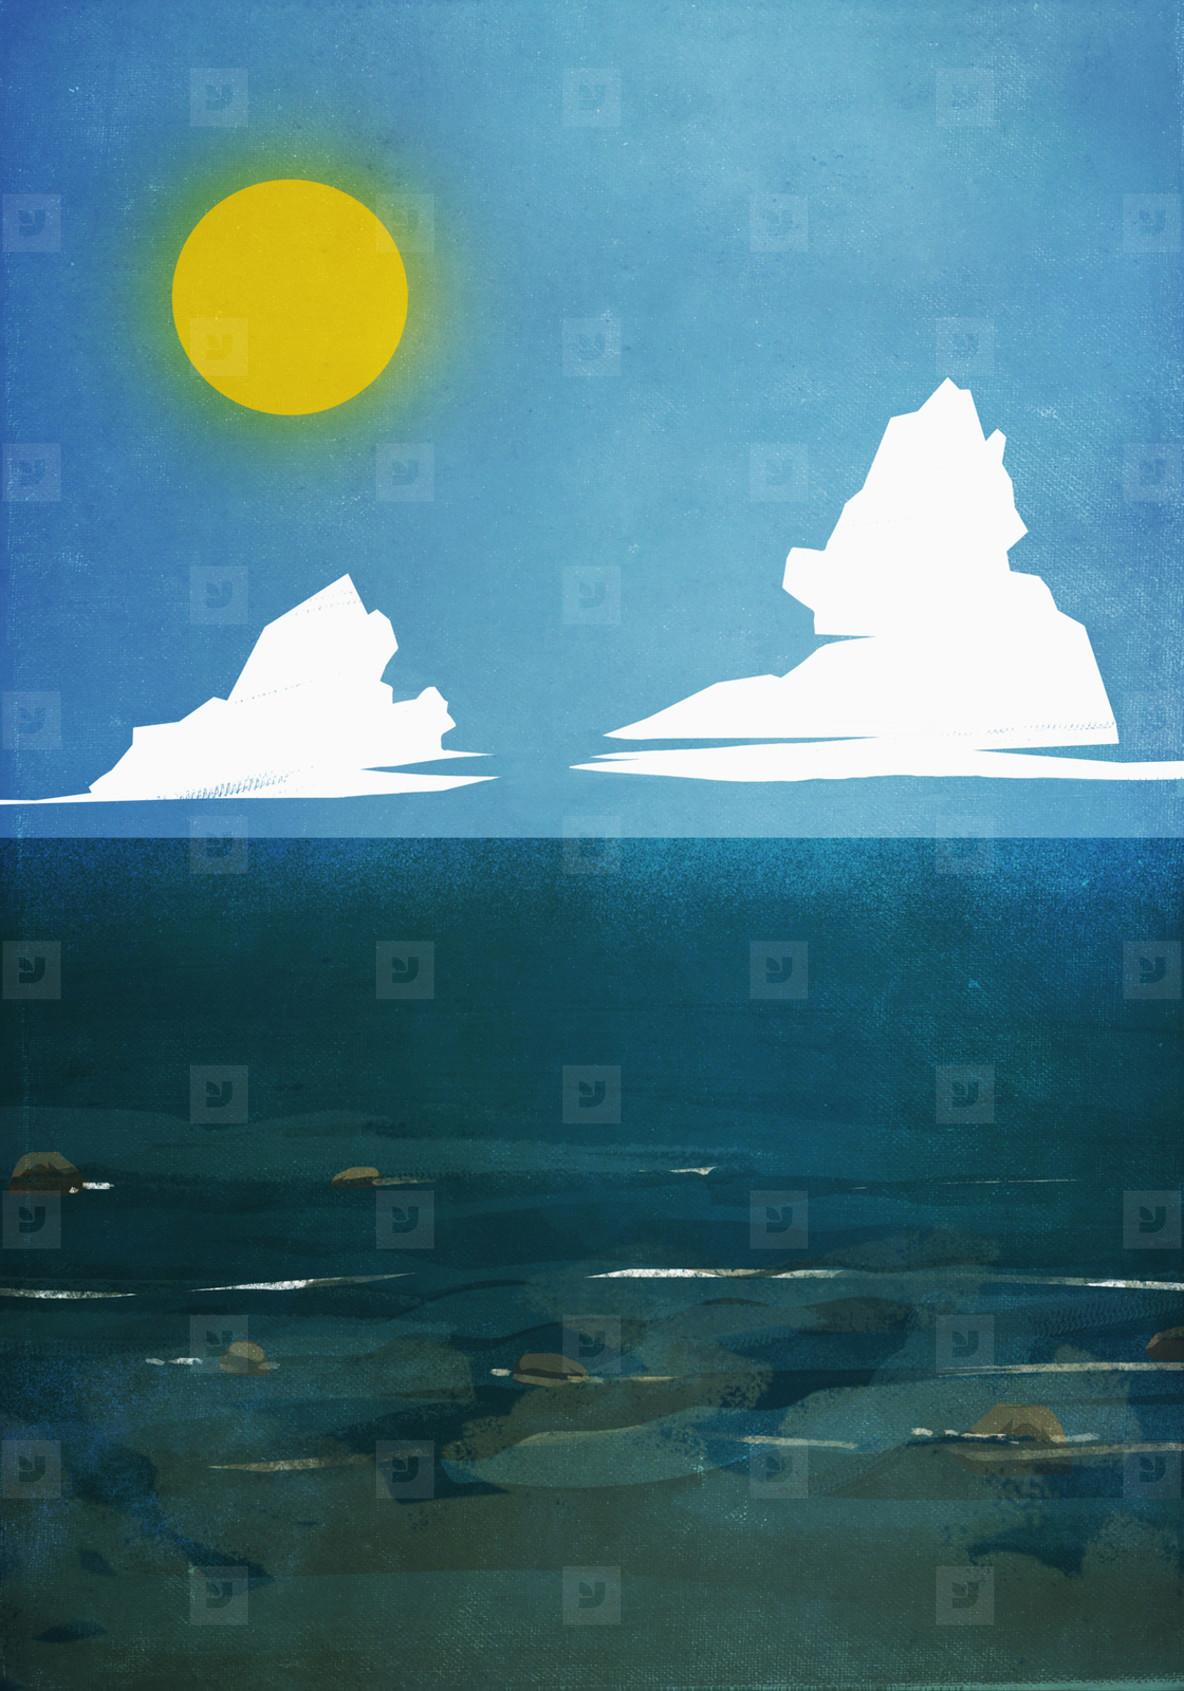 Sun shining over blue ocean